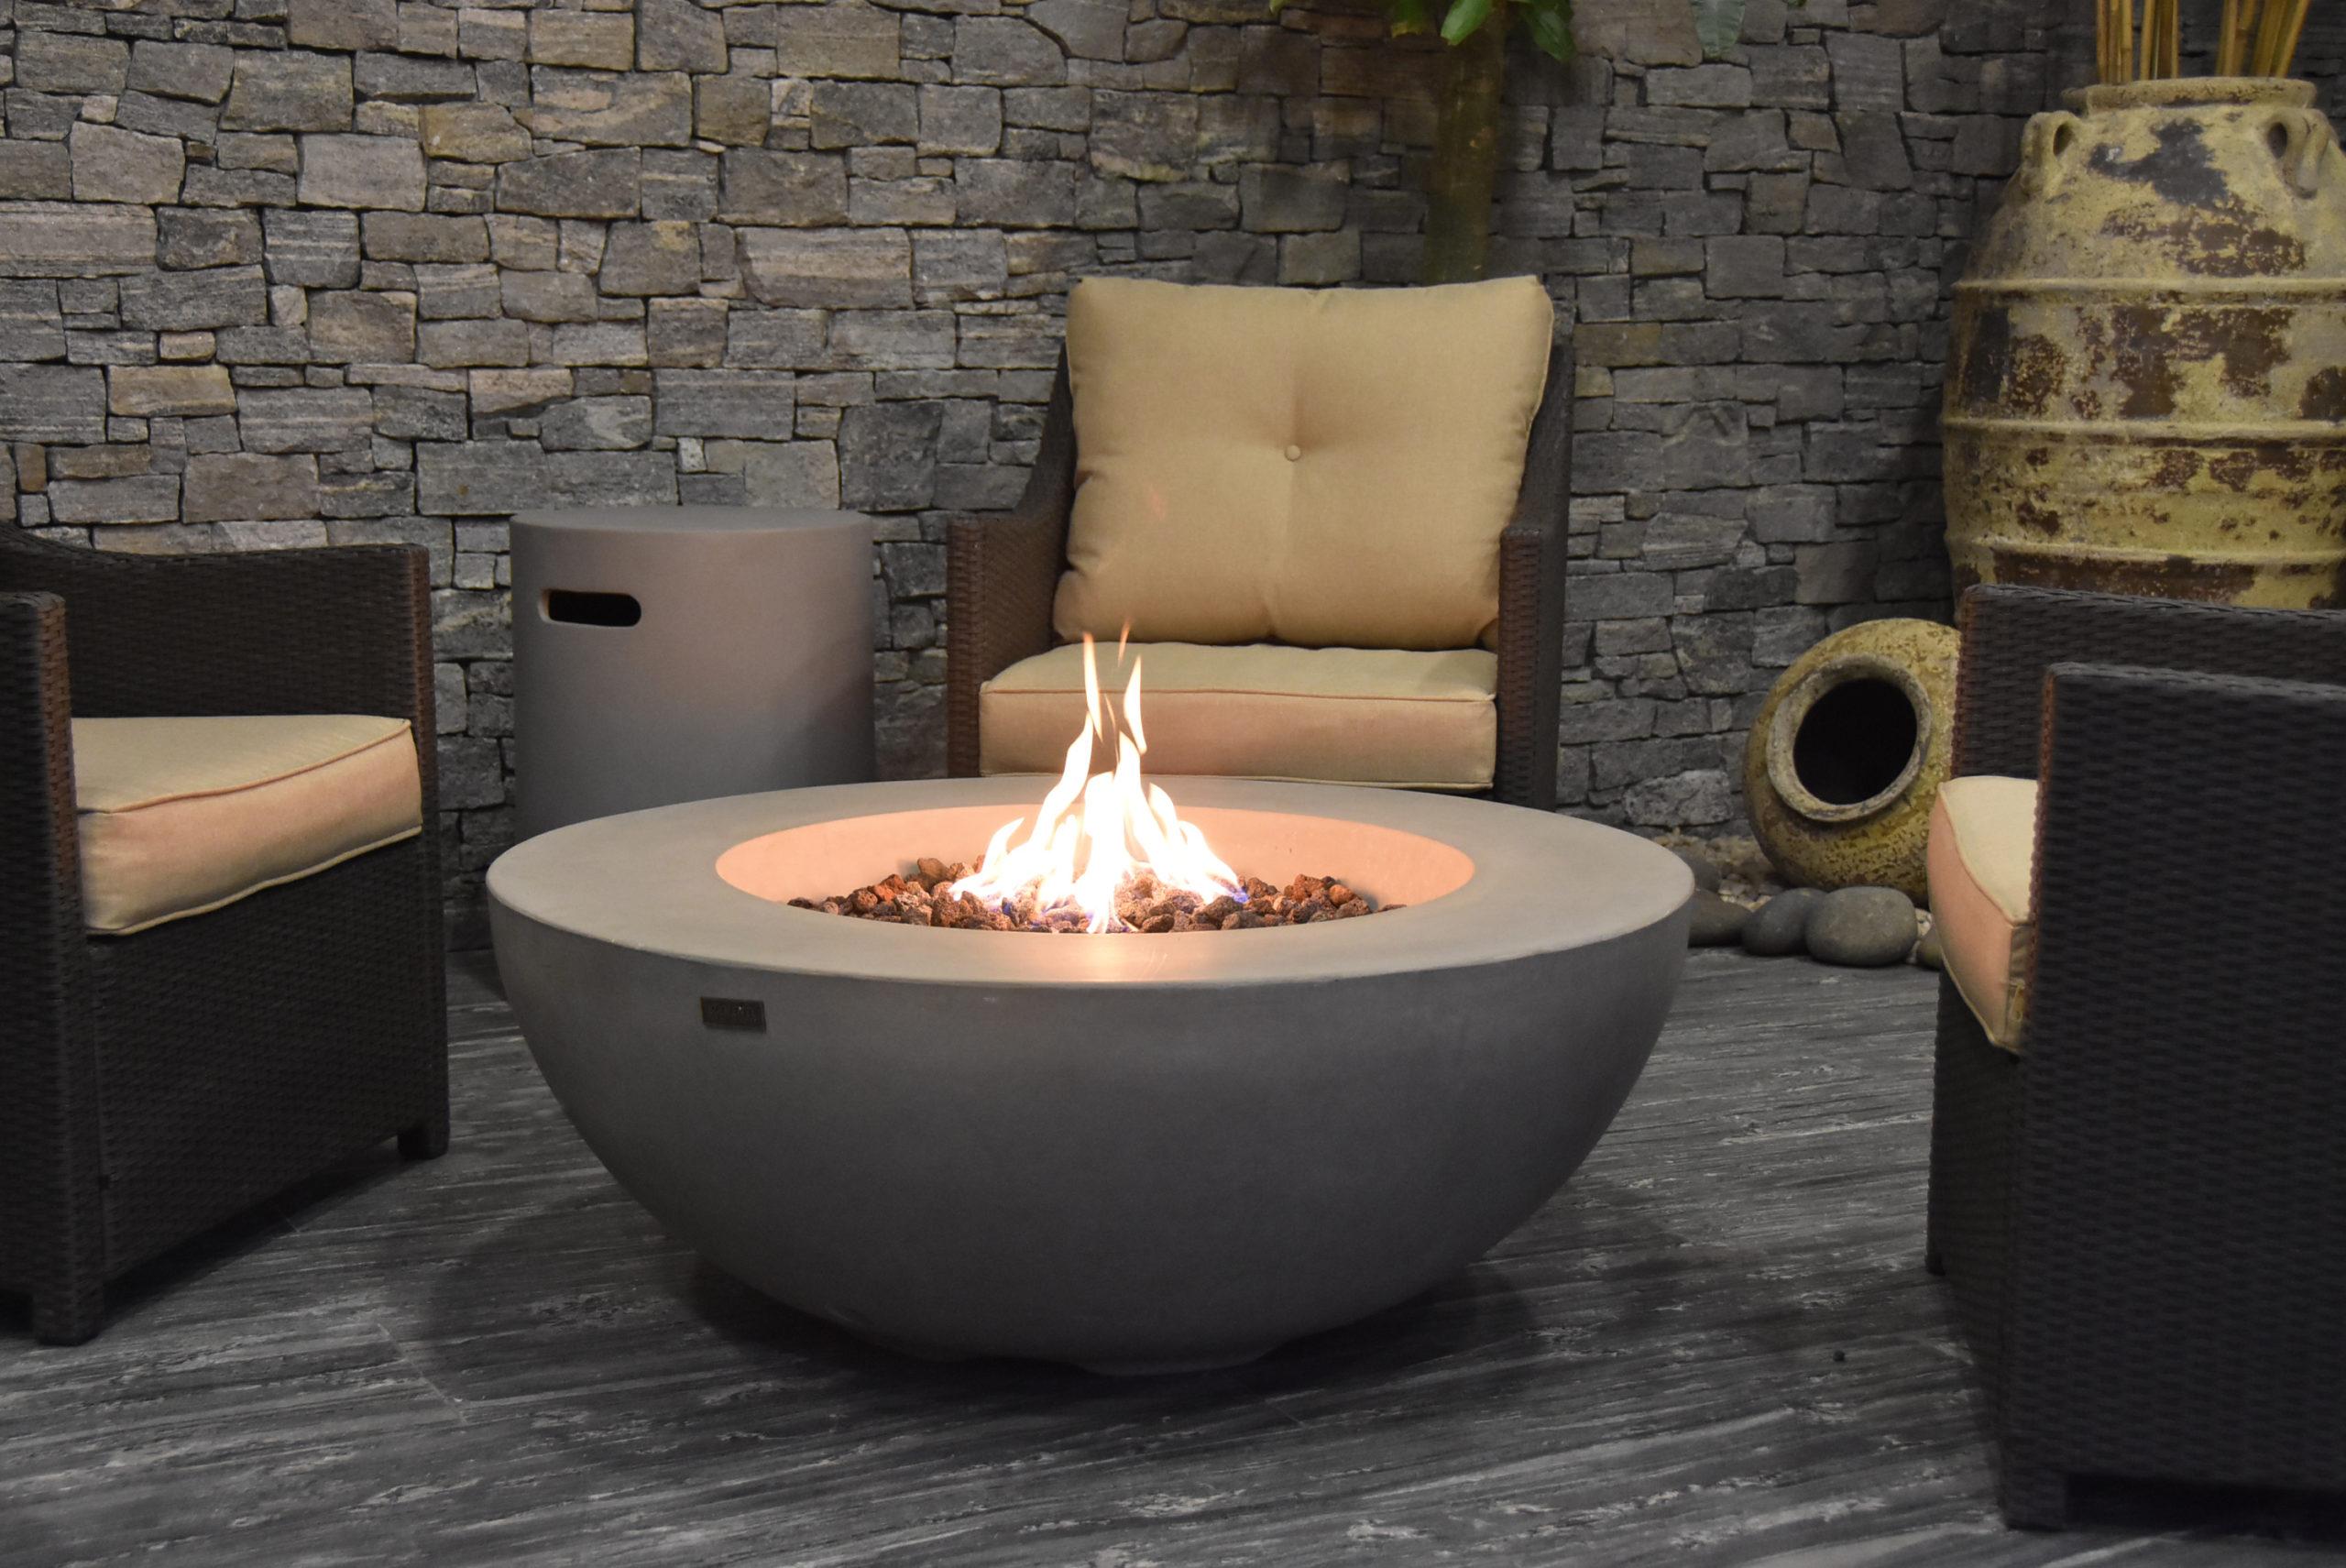 Elementi fire pit in a backyard with patio furniture